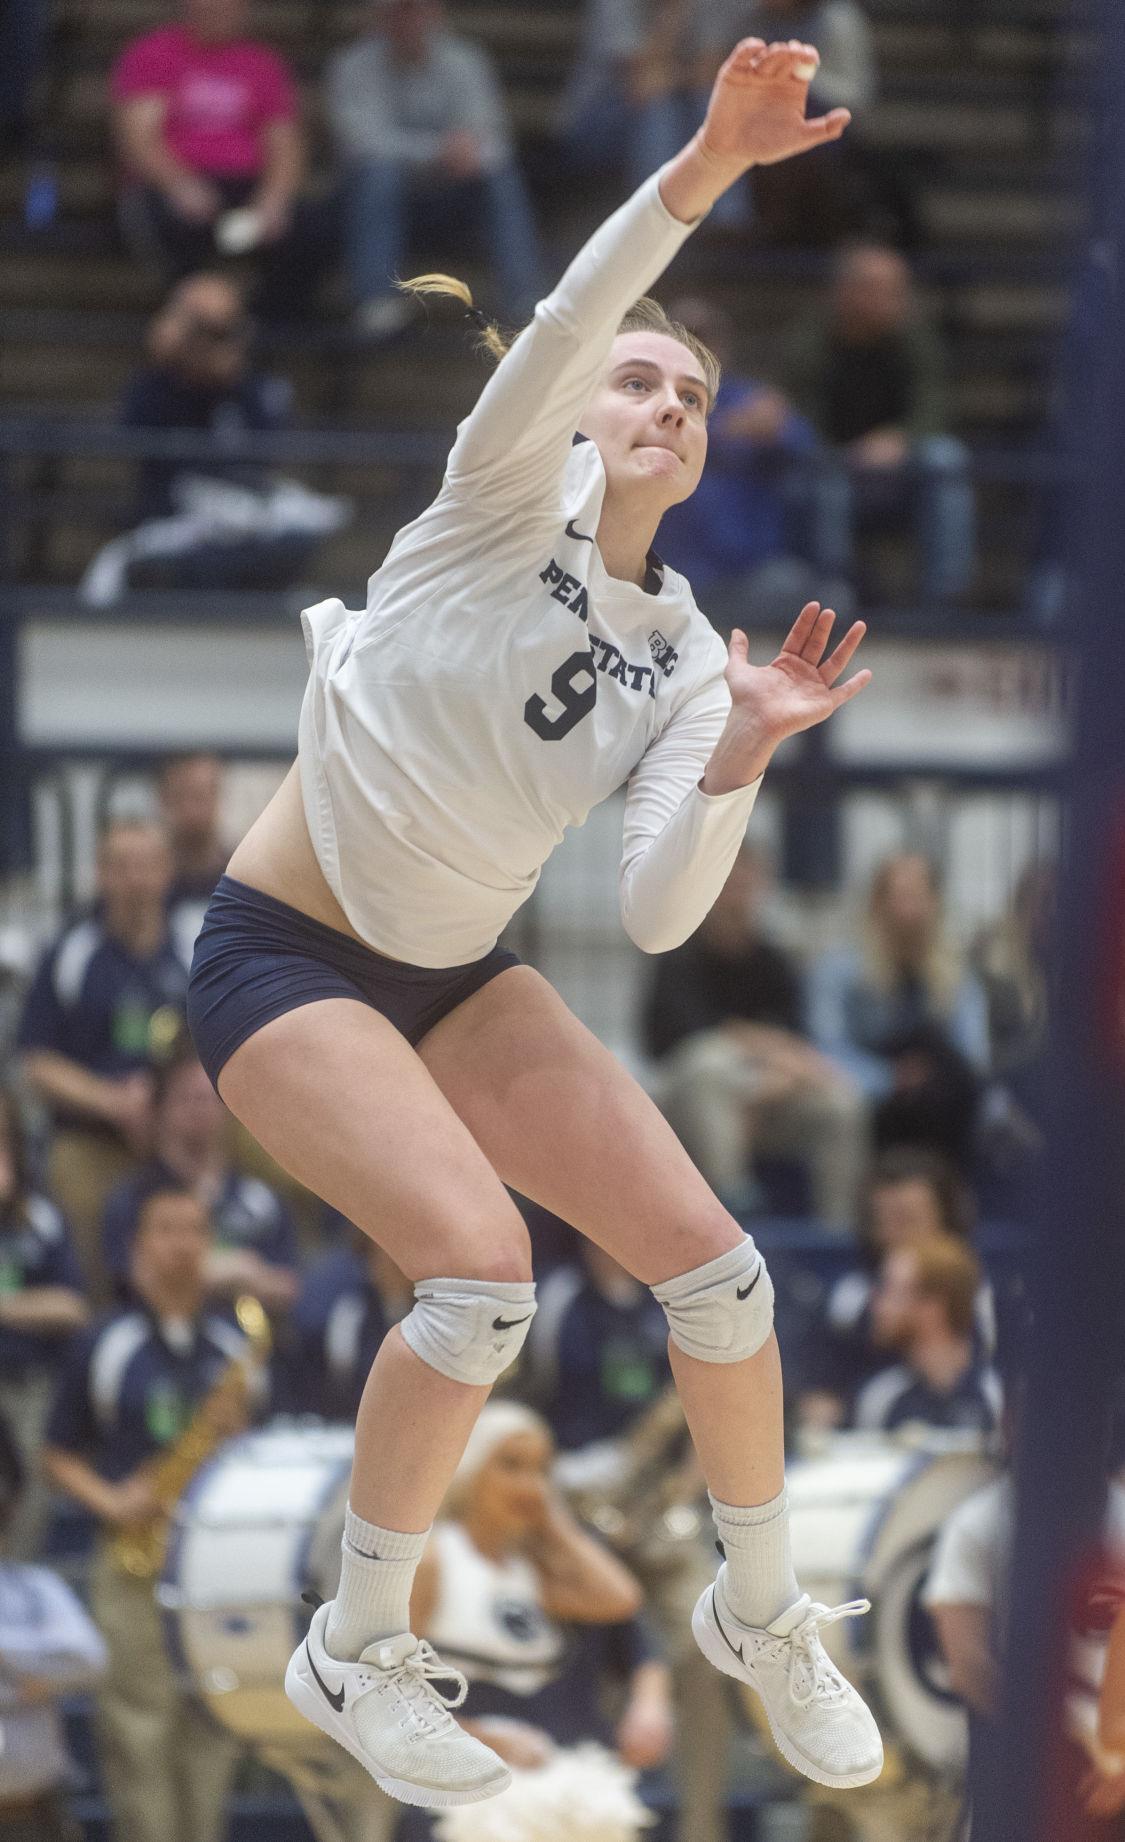 NCAA Women's Volleyball Regional second round, Jonni Parker (9) serves